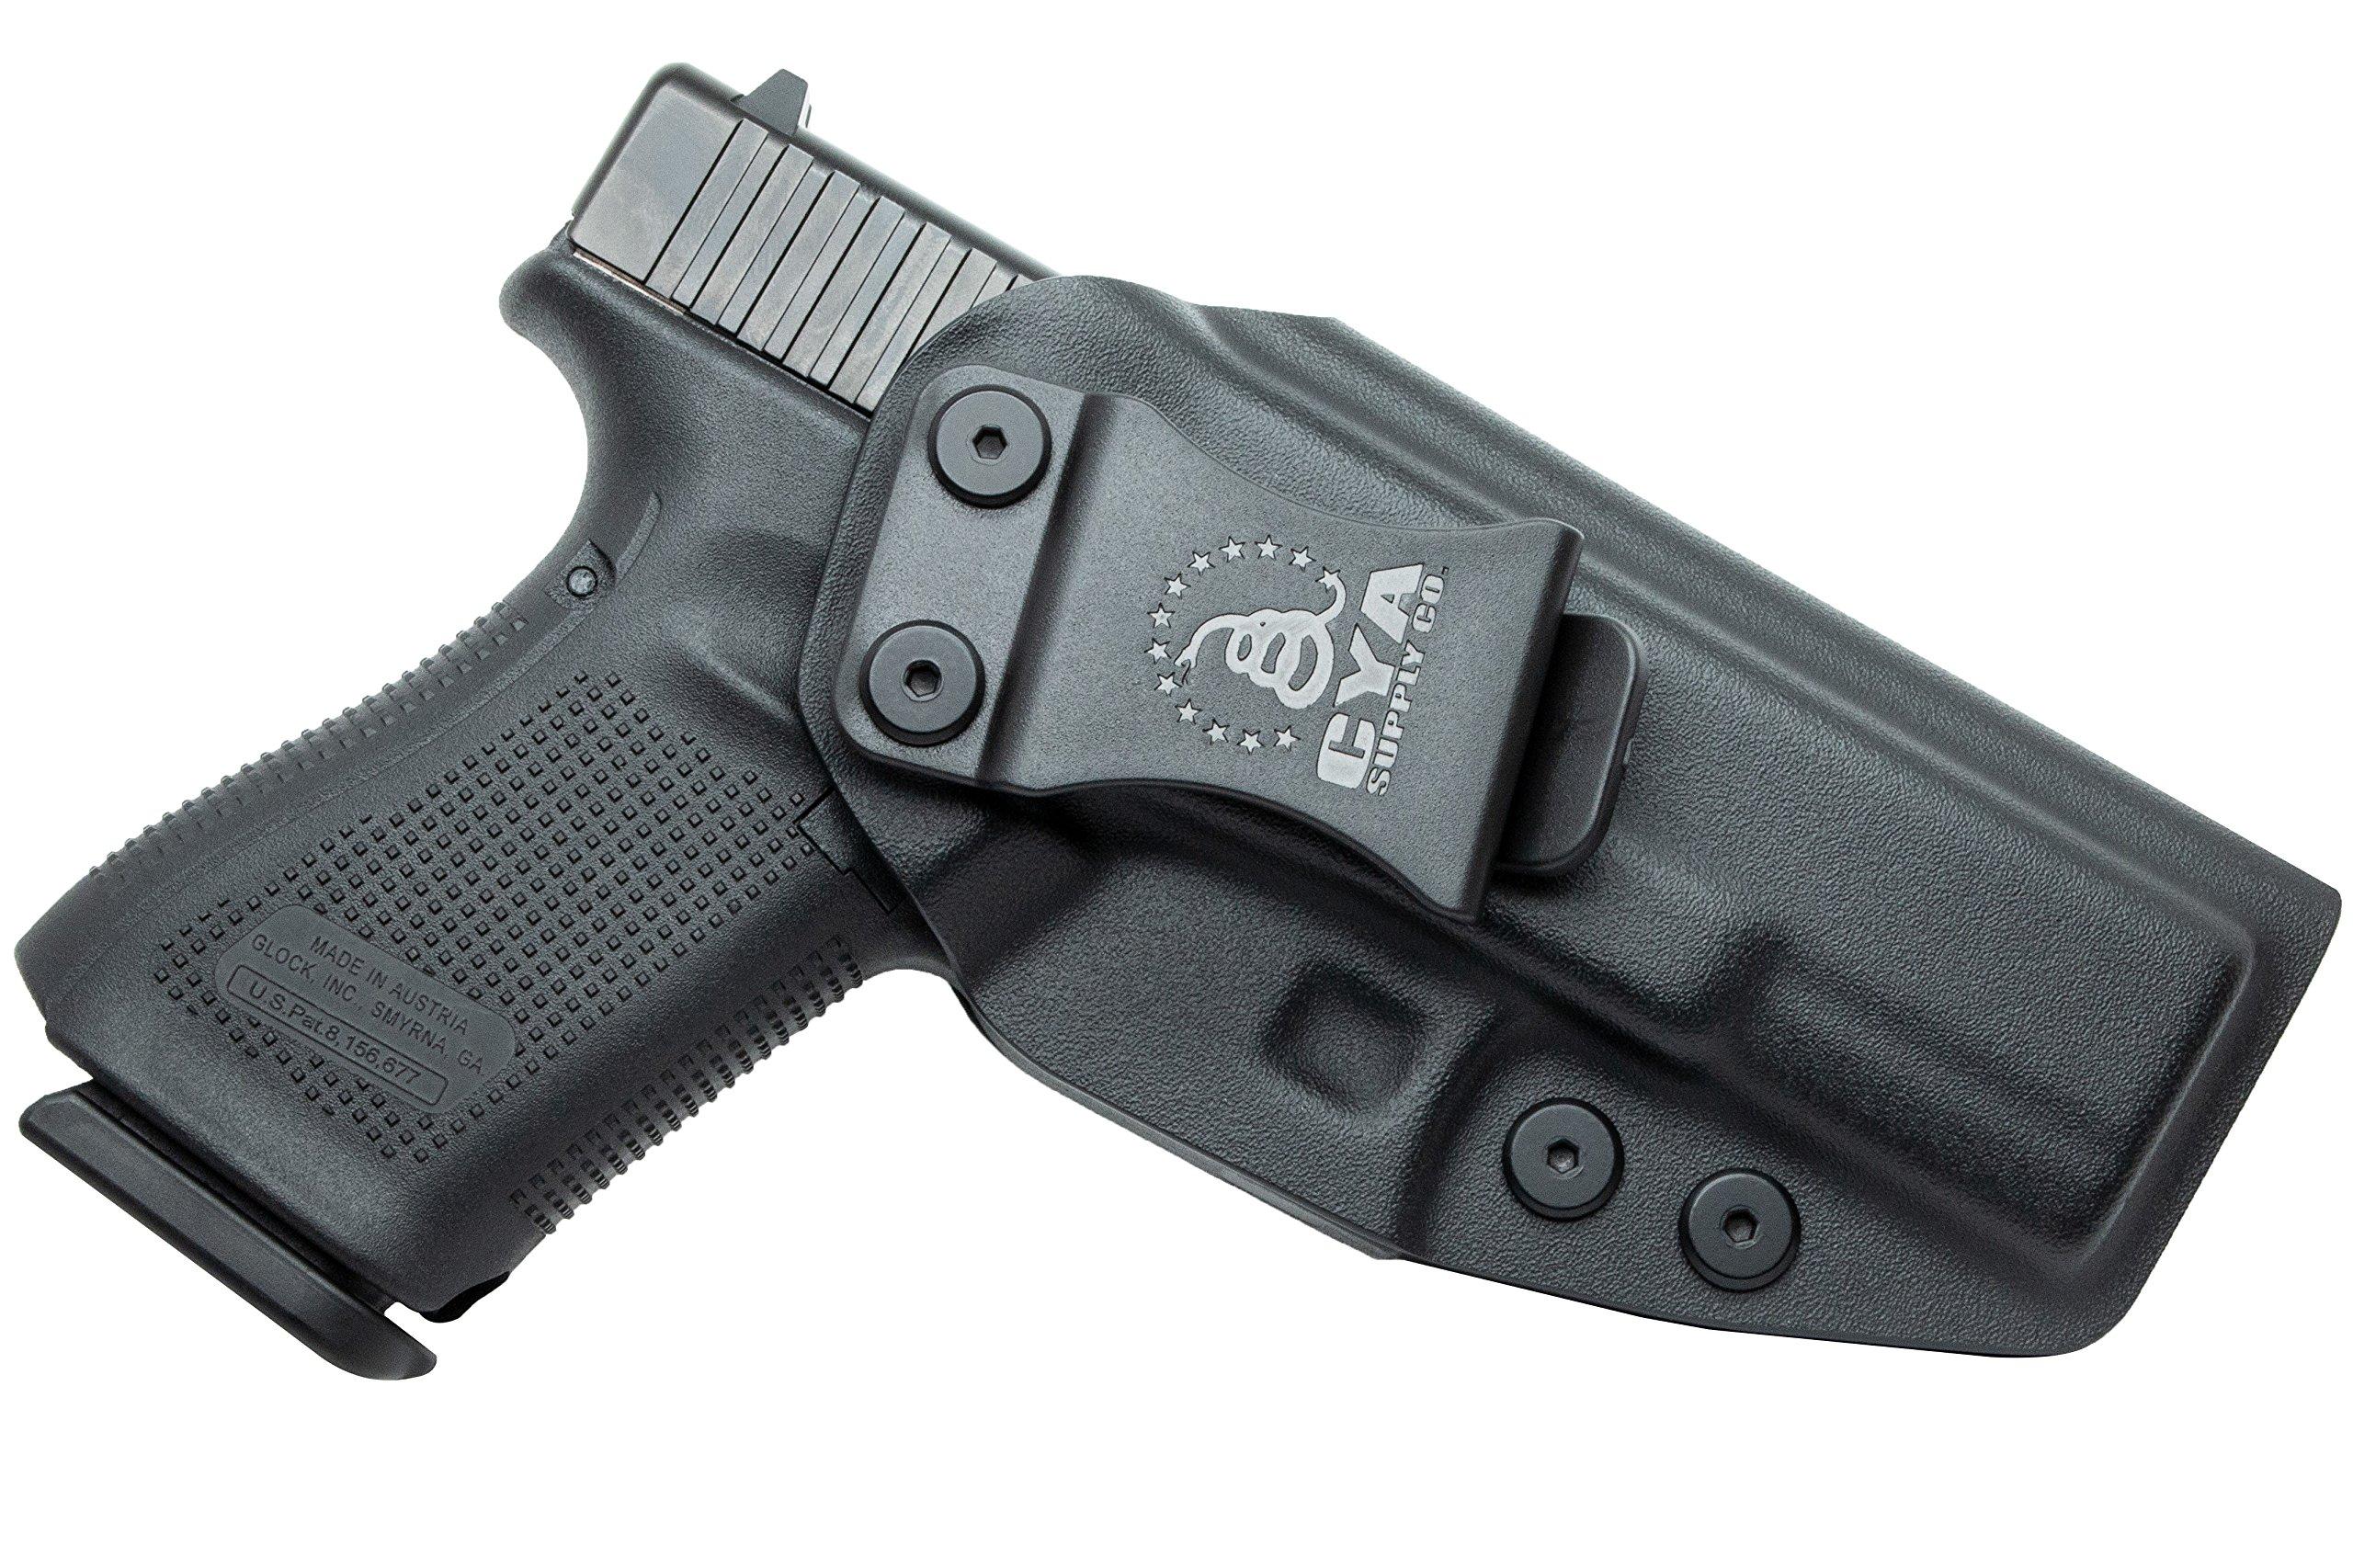 23 32 Black Carbon Fiber Kydex holster IWB right Concealment Fits Glock 19